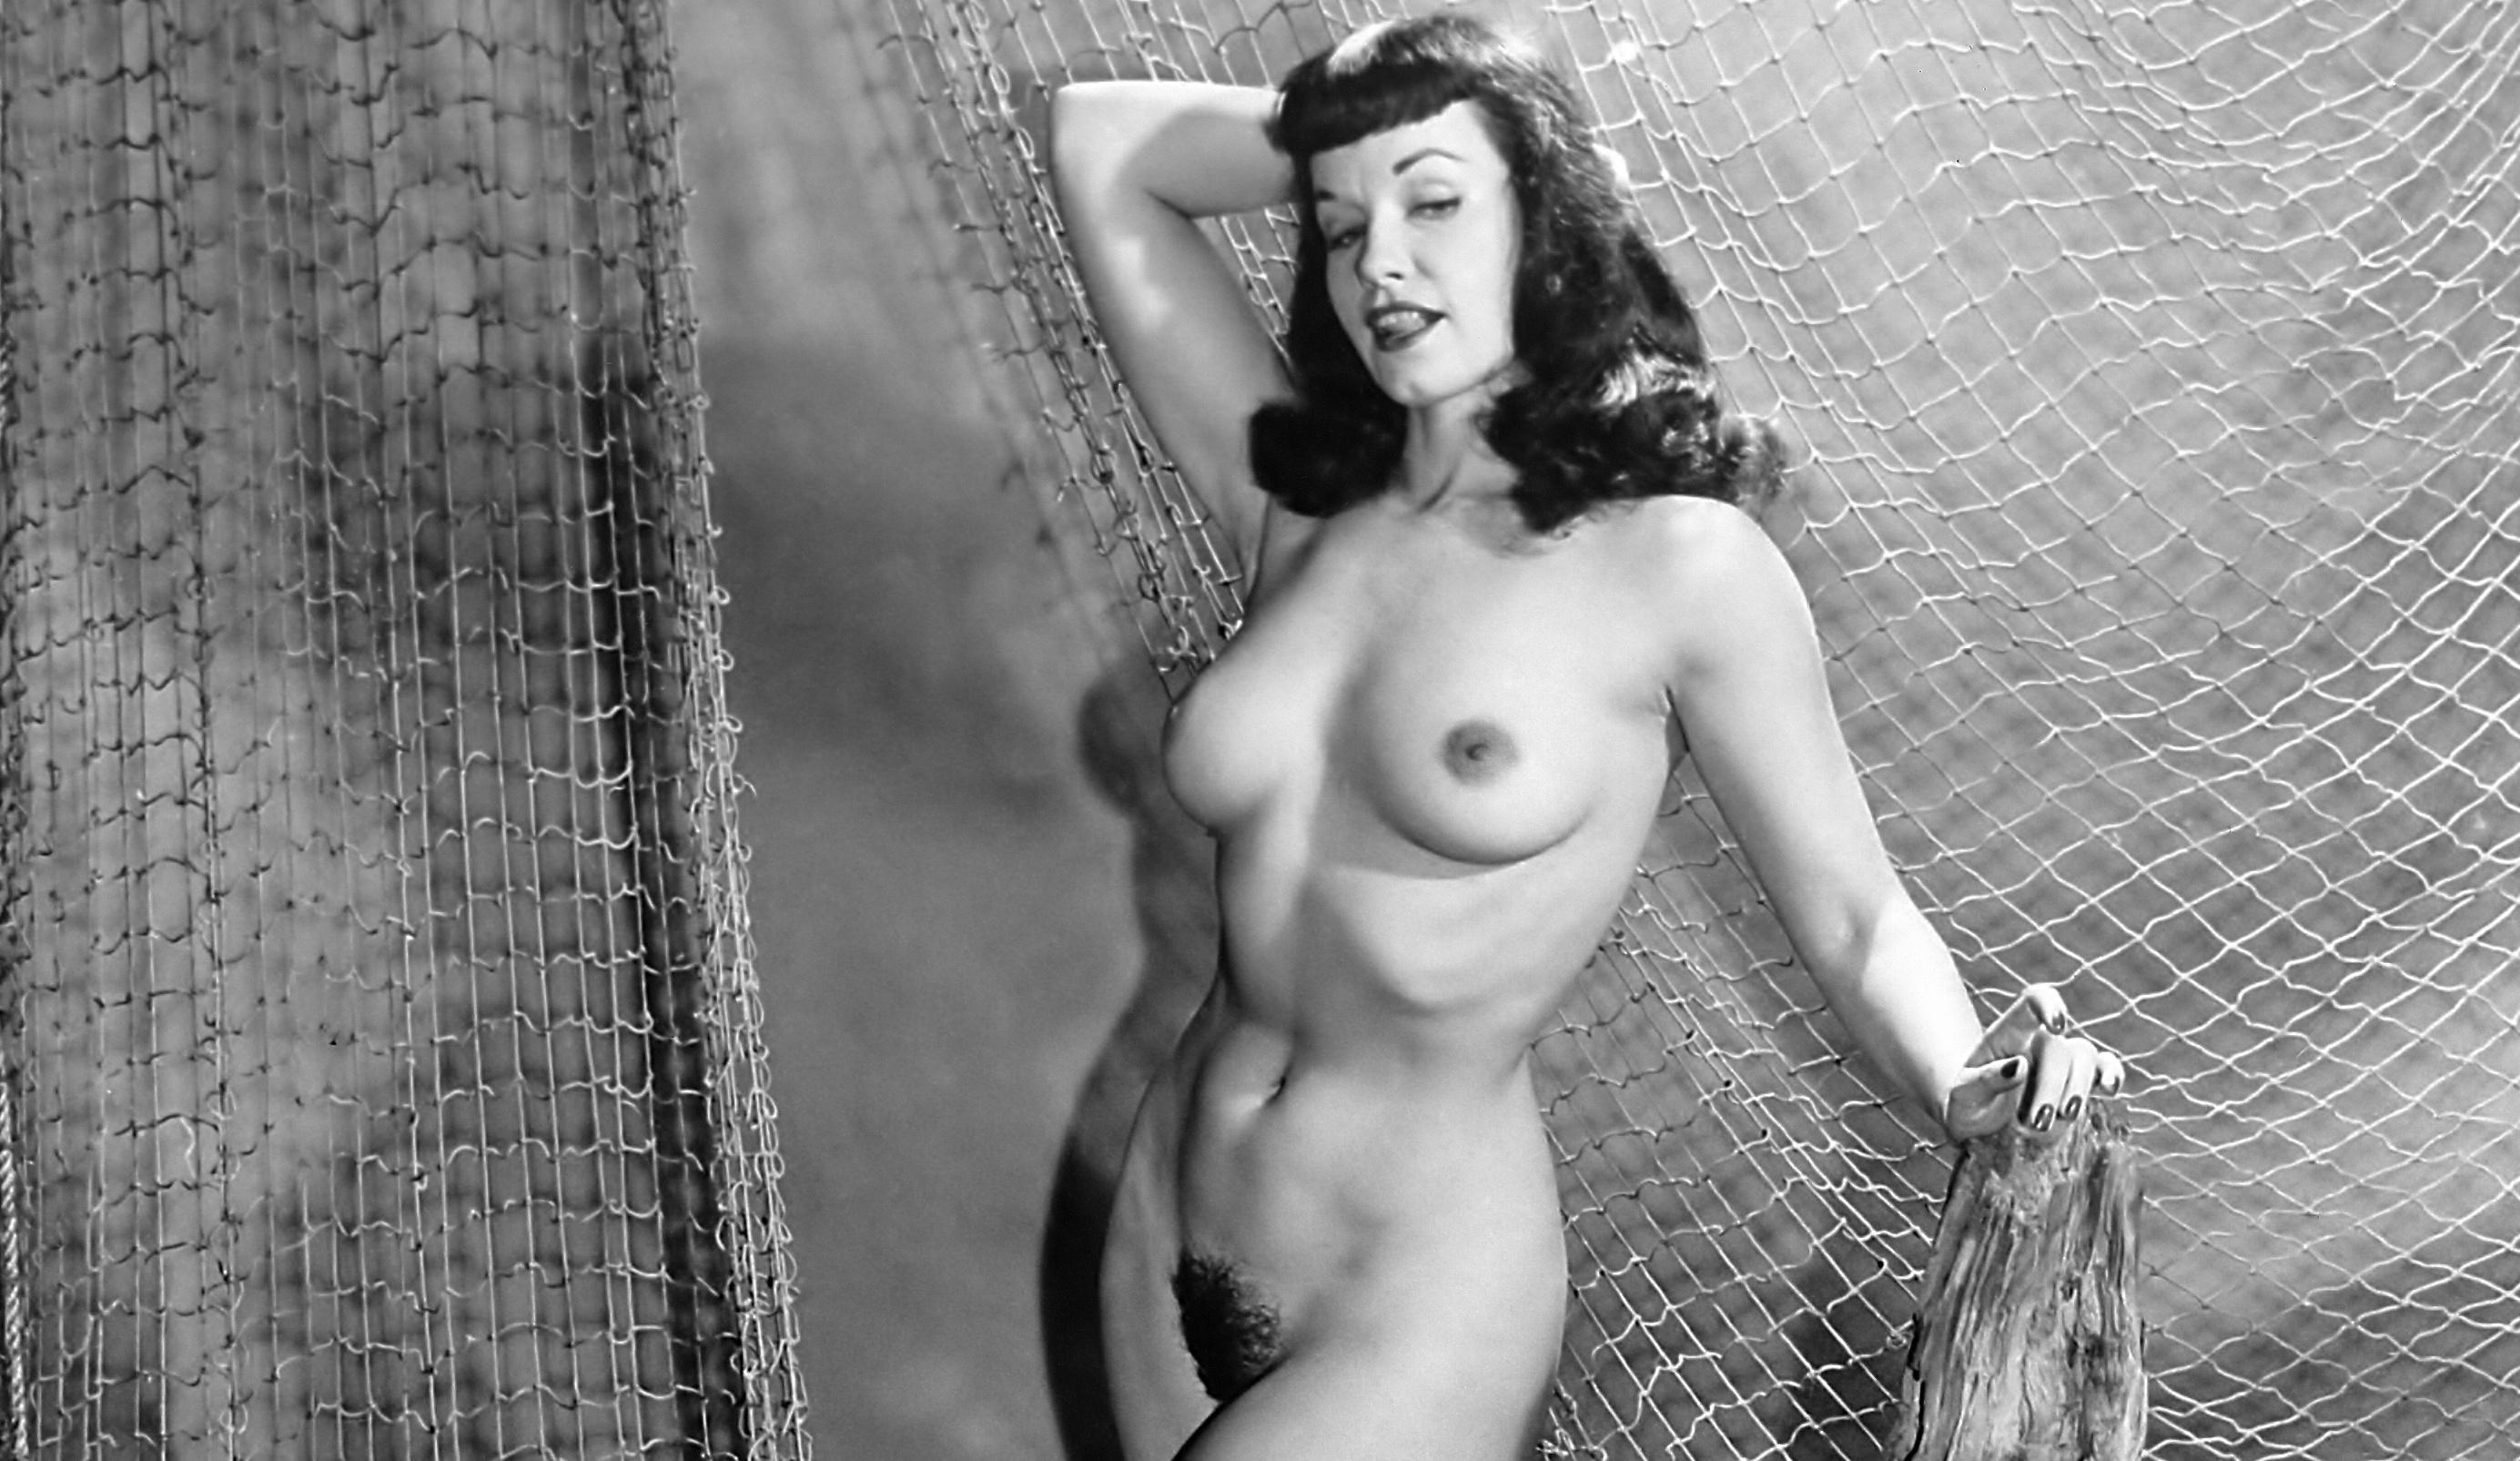 Davela maynard nude pics